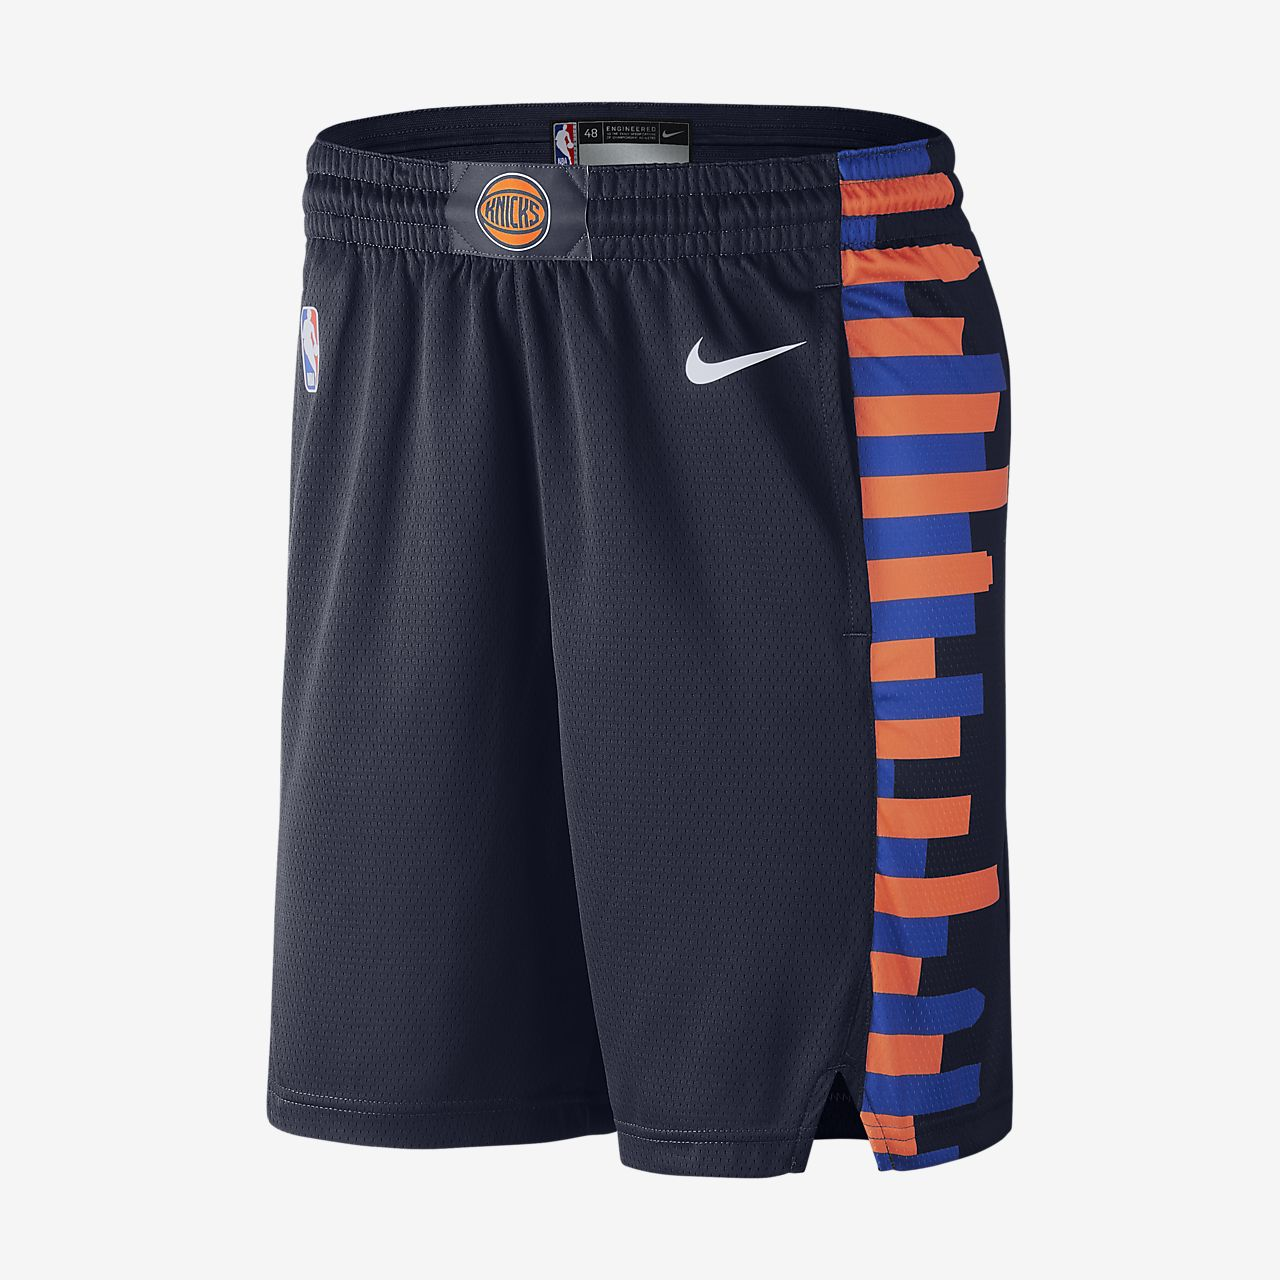 cbd47aaeee7 New York Knicks City Edition Swingman Men's Nike NBA Shorts. Nike.com